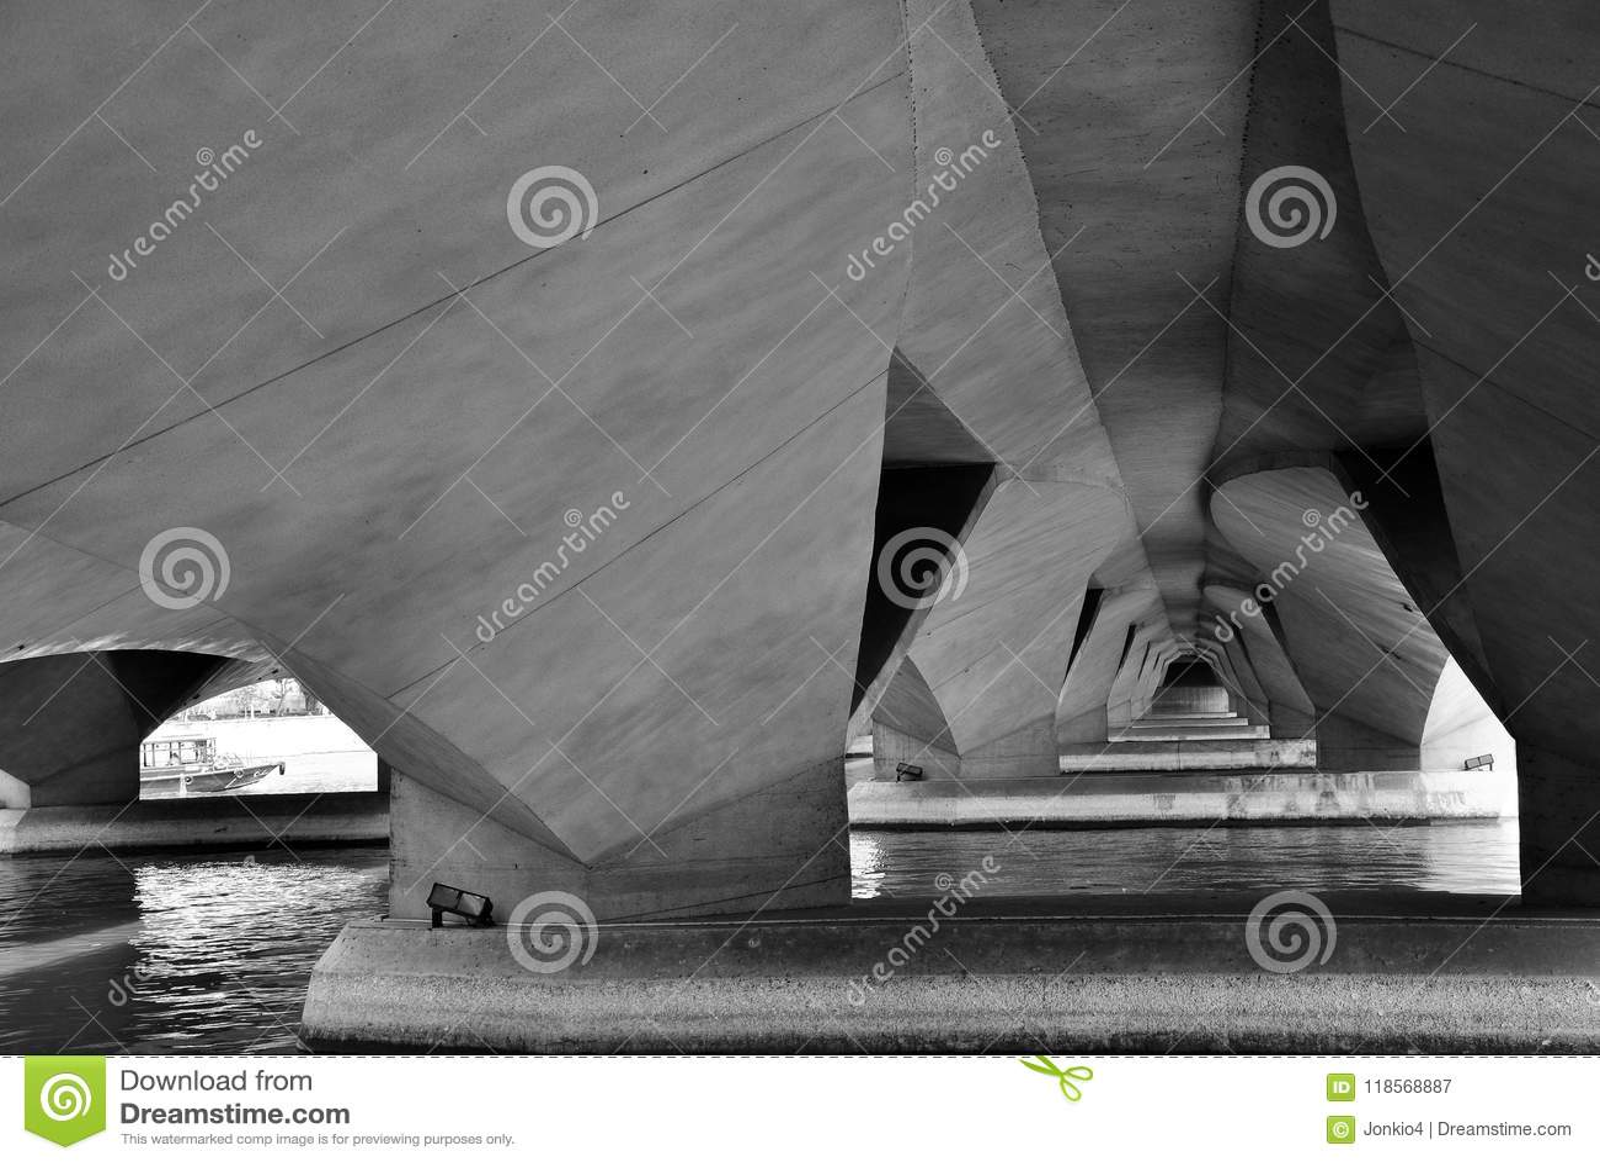 Underneath view of Esplanade Bridge, Singapore